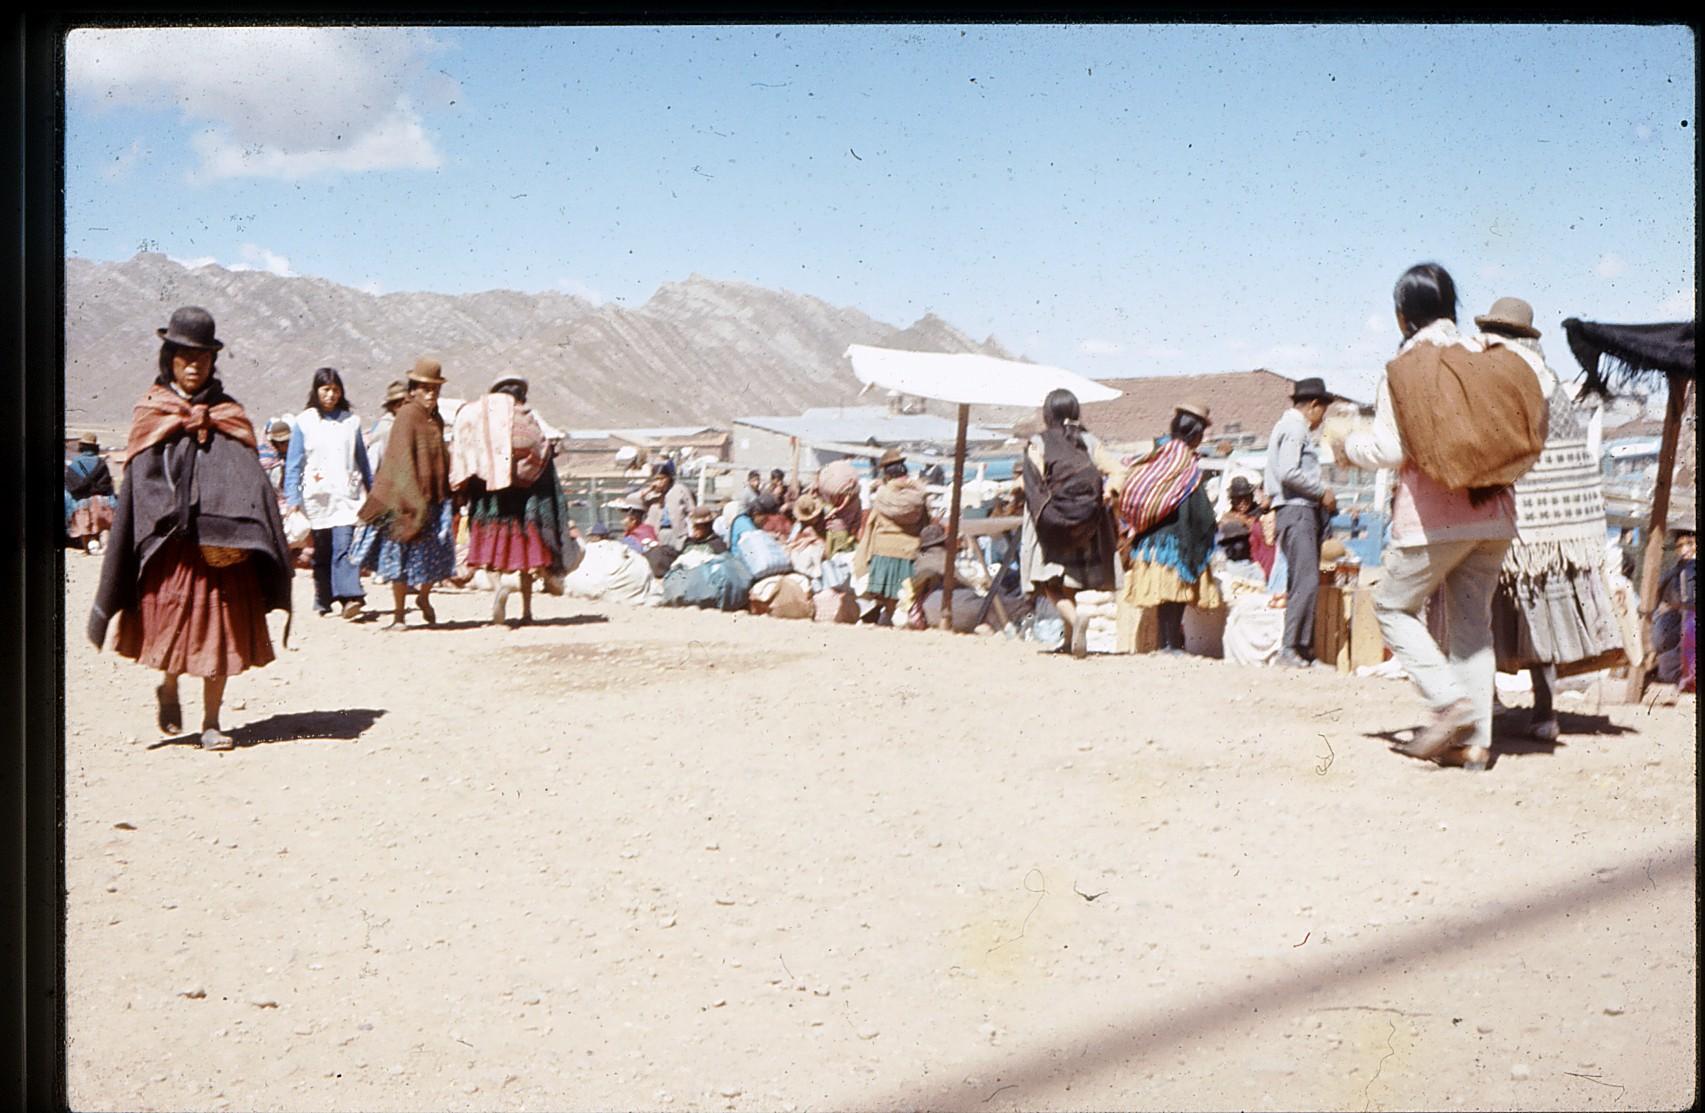 southamerica1972-8